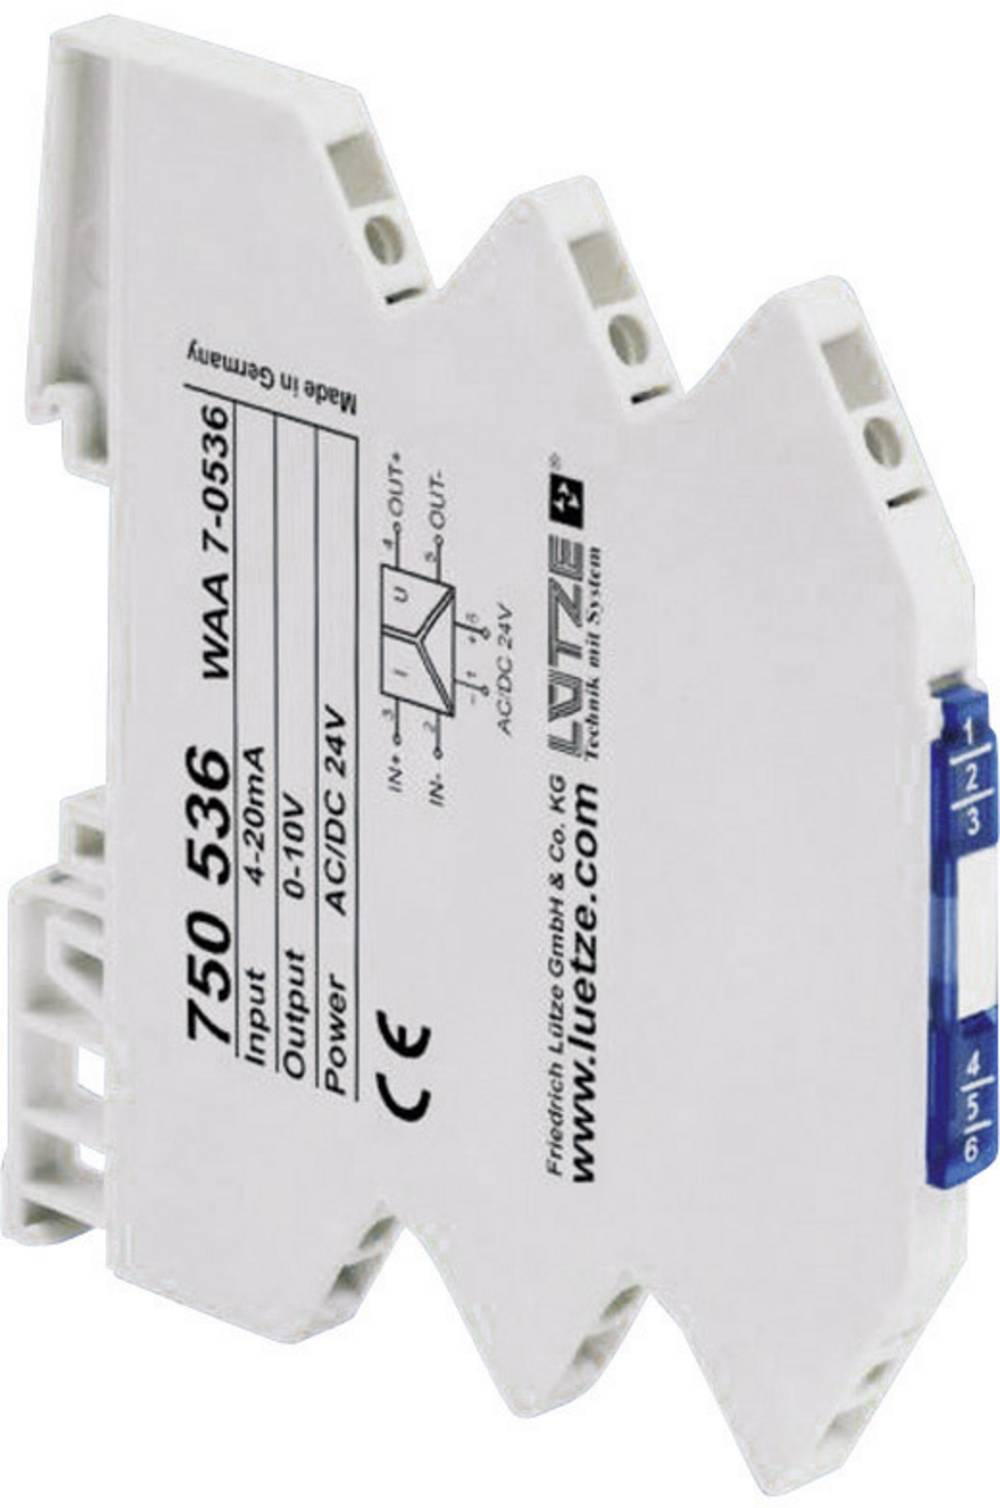 3-smjerni pretvarač normiranogsignala Ltze WAA 7-0536 750536 Lütze